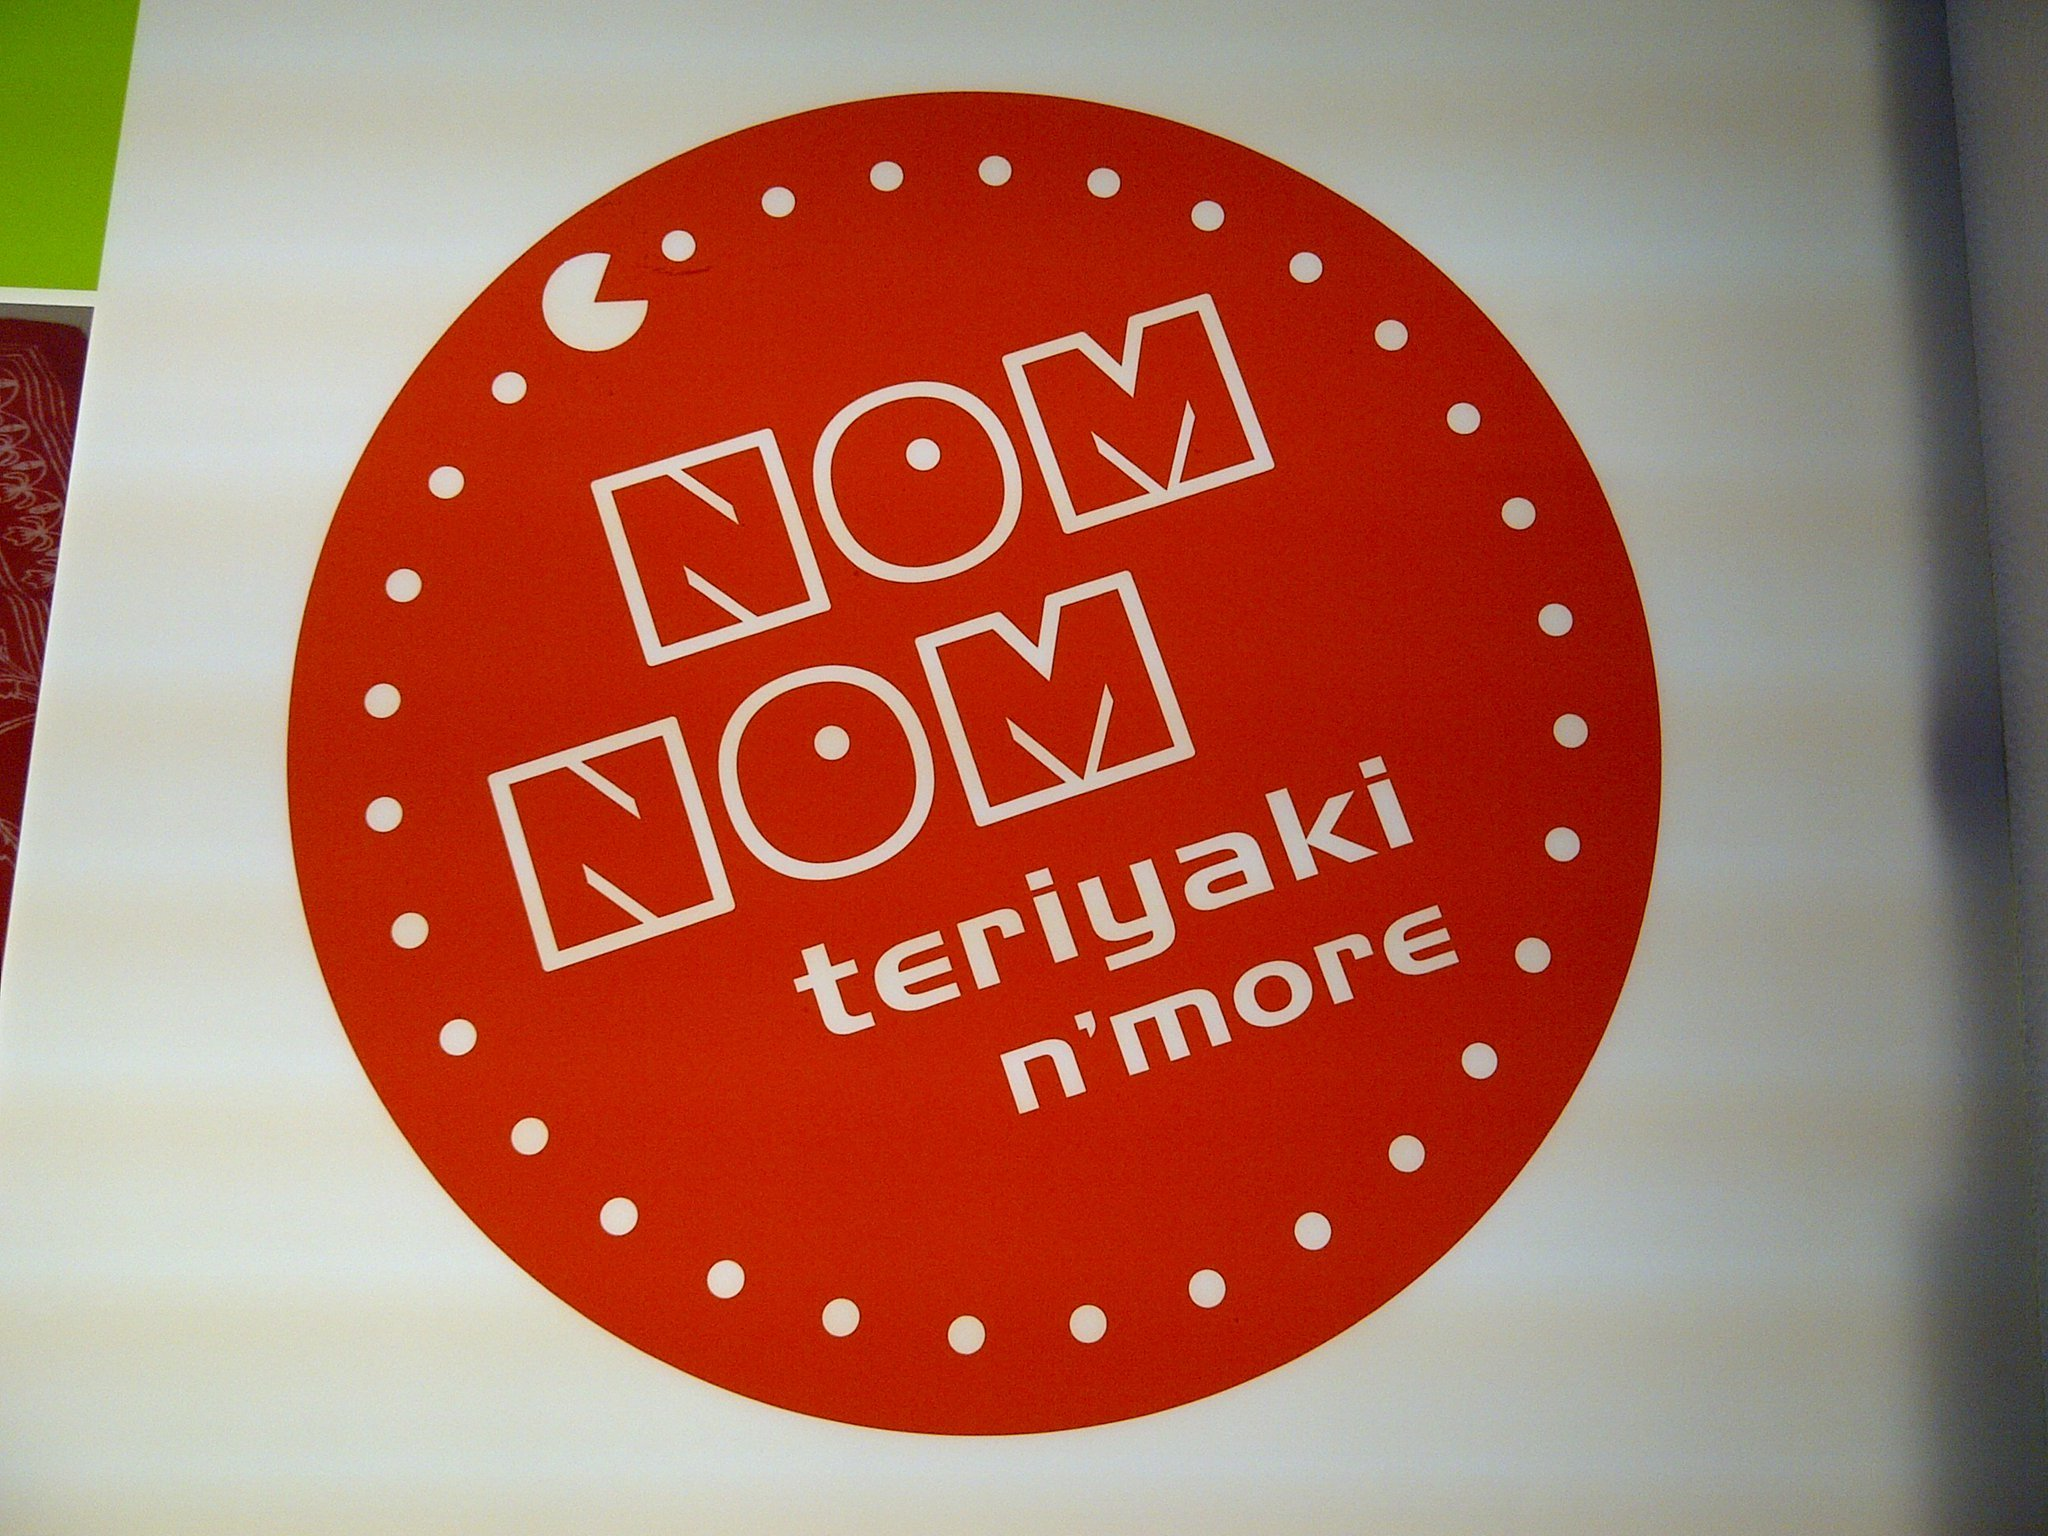 nom2 at Nom Nom Teriyaki n' More